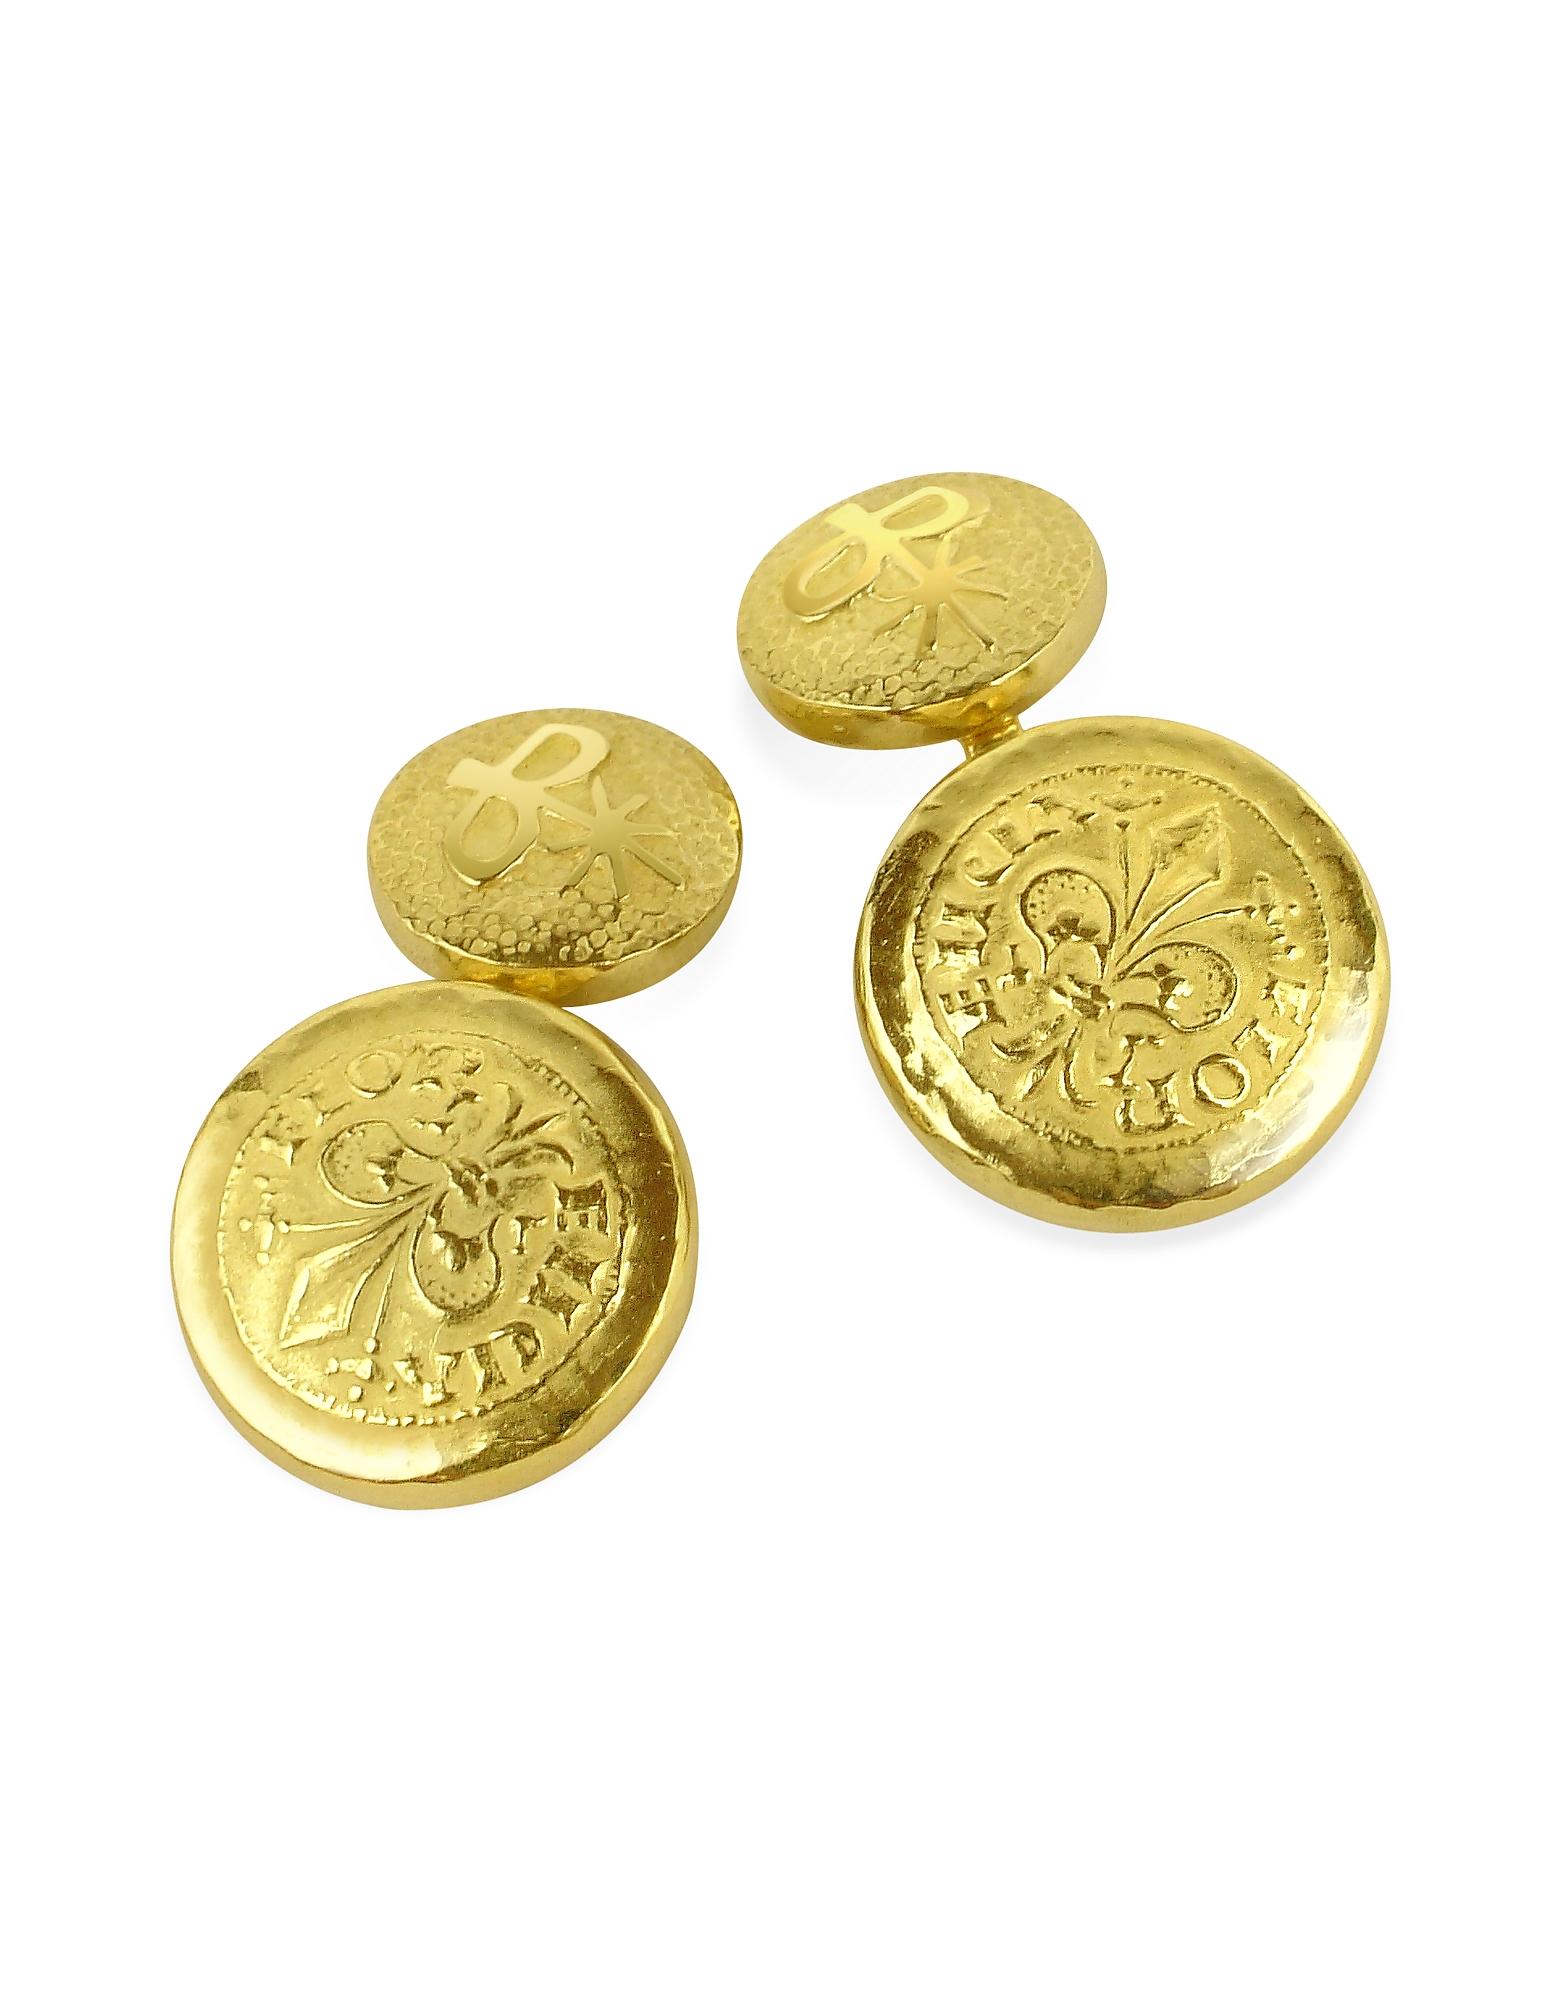 Torrini Fiorino - Запонки из Желтого Золота 18 карат с Флорентийским Узором Fleur-de-Lis